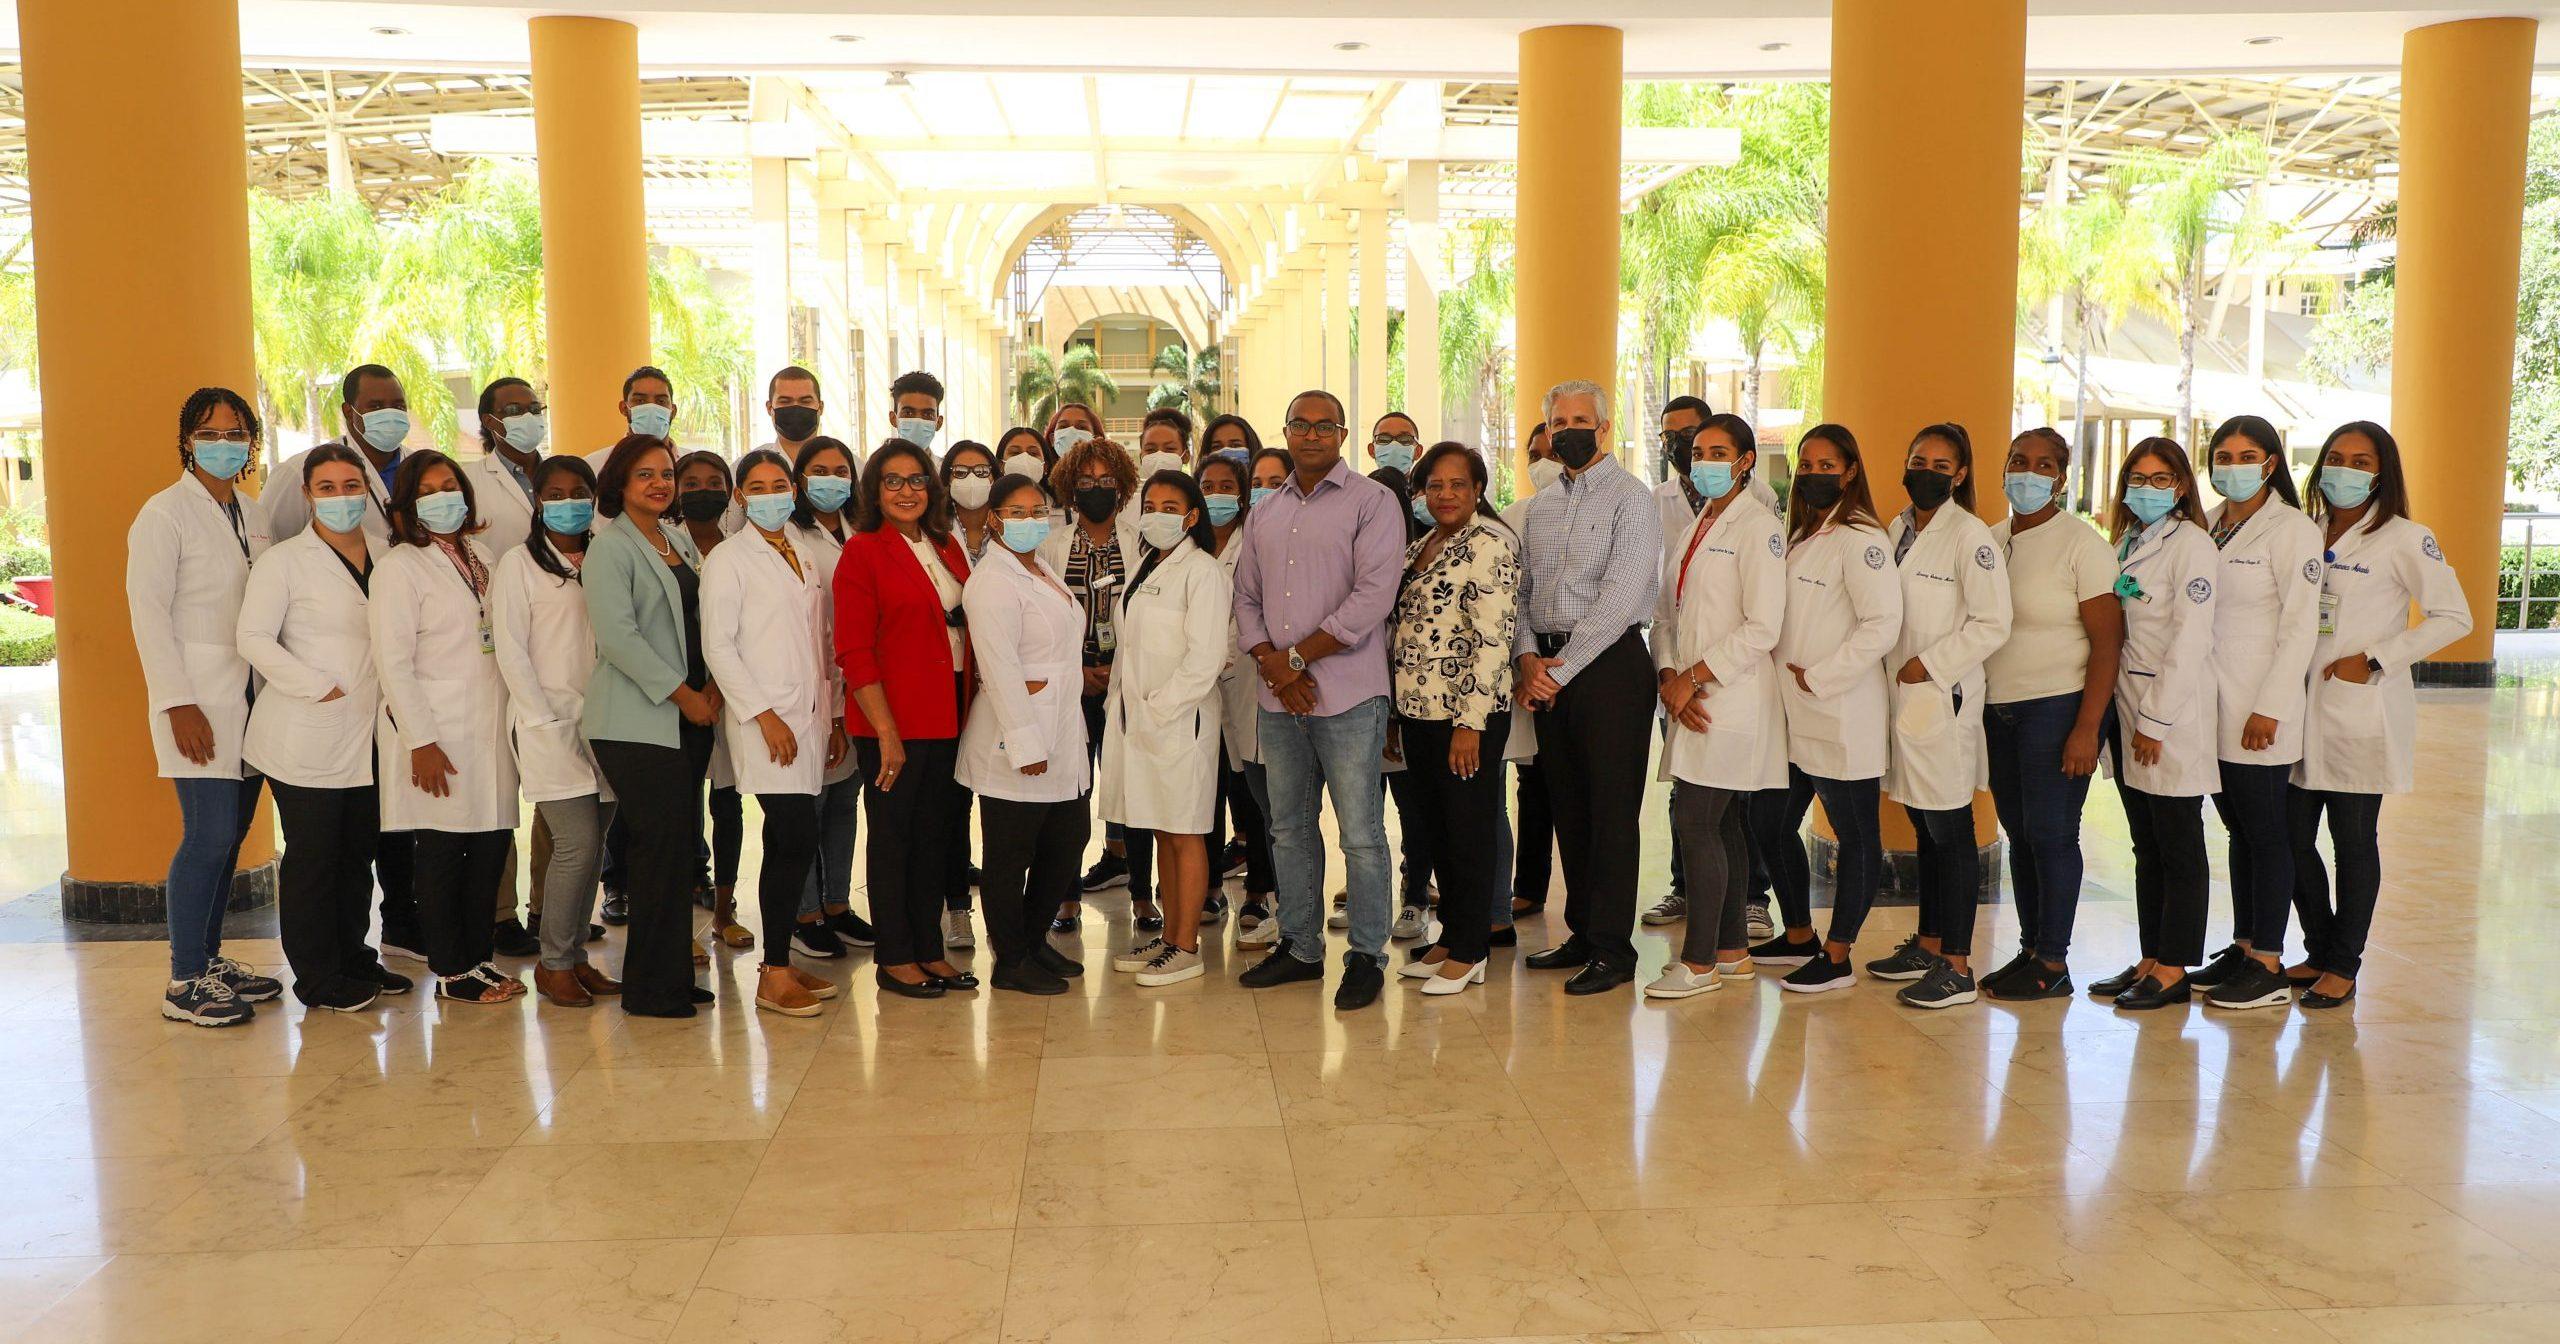 UASD Recinto San Juan recibe primer grupo de estudiantes de medicina para internado rotatorio